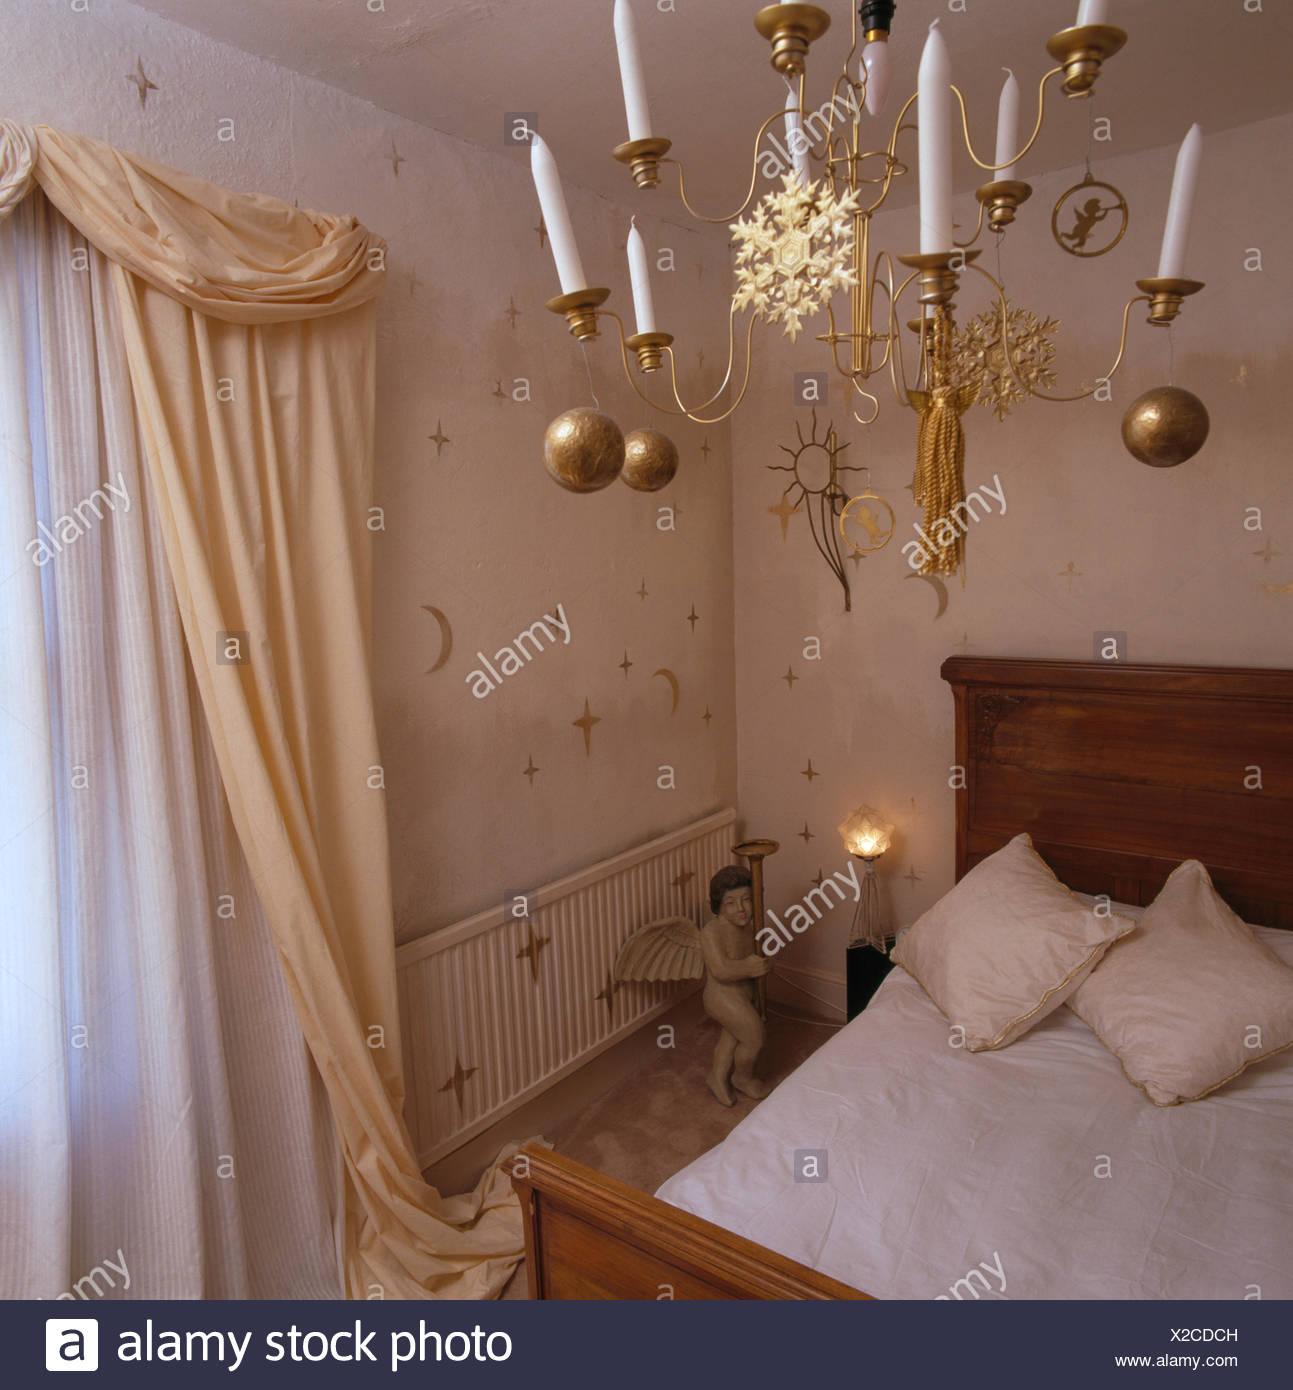 schlafzimmer kerzen, kerzen im kronleuchter aus messing verziert mit goldenen kugeln in, Design ideen